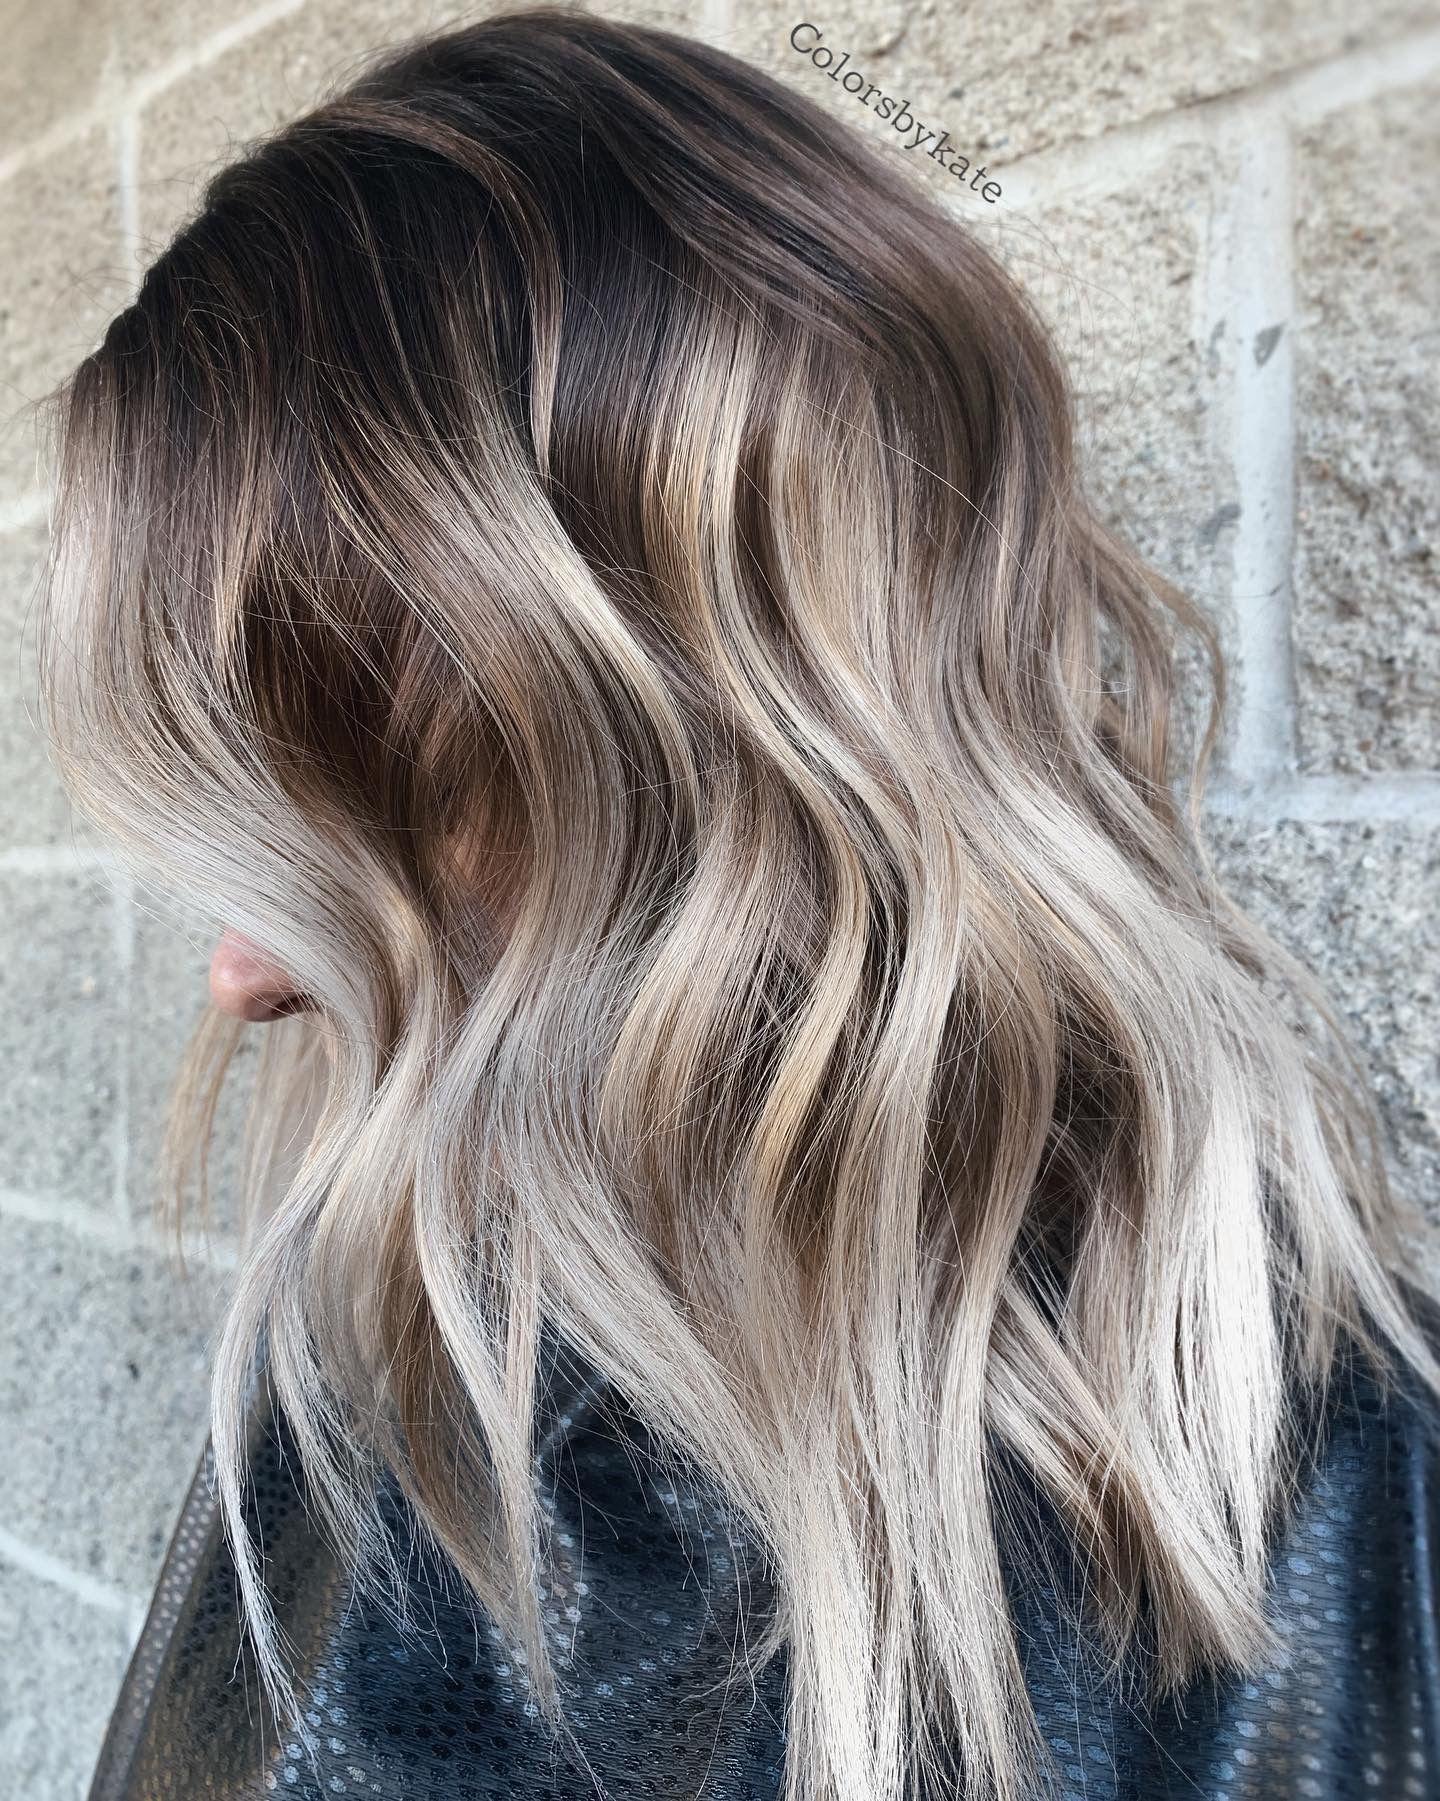 Platinum Blonde Highlights Balayage Ombre Hair Balayage Balayage Hair Brunette With Blonde Ombre Blonde In 2020 Icy Blonde Hair Brown Blonde Hair Ombre Hair Blonde